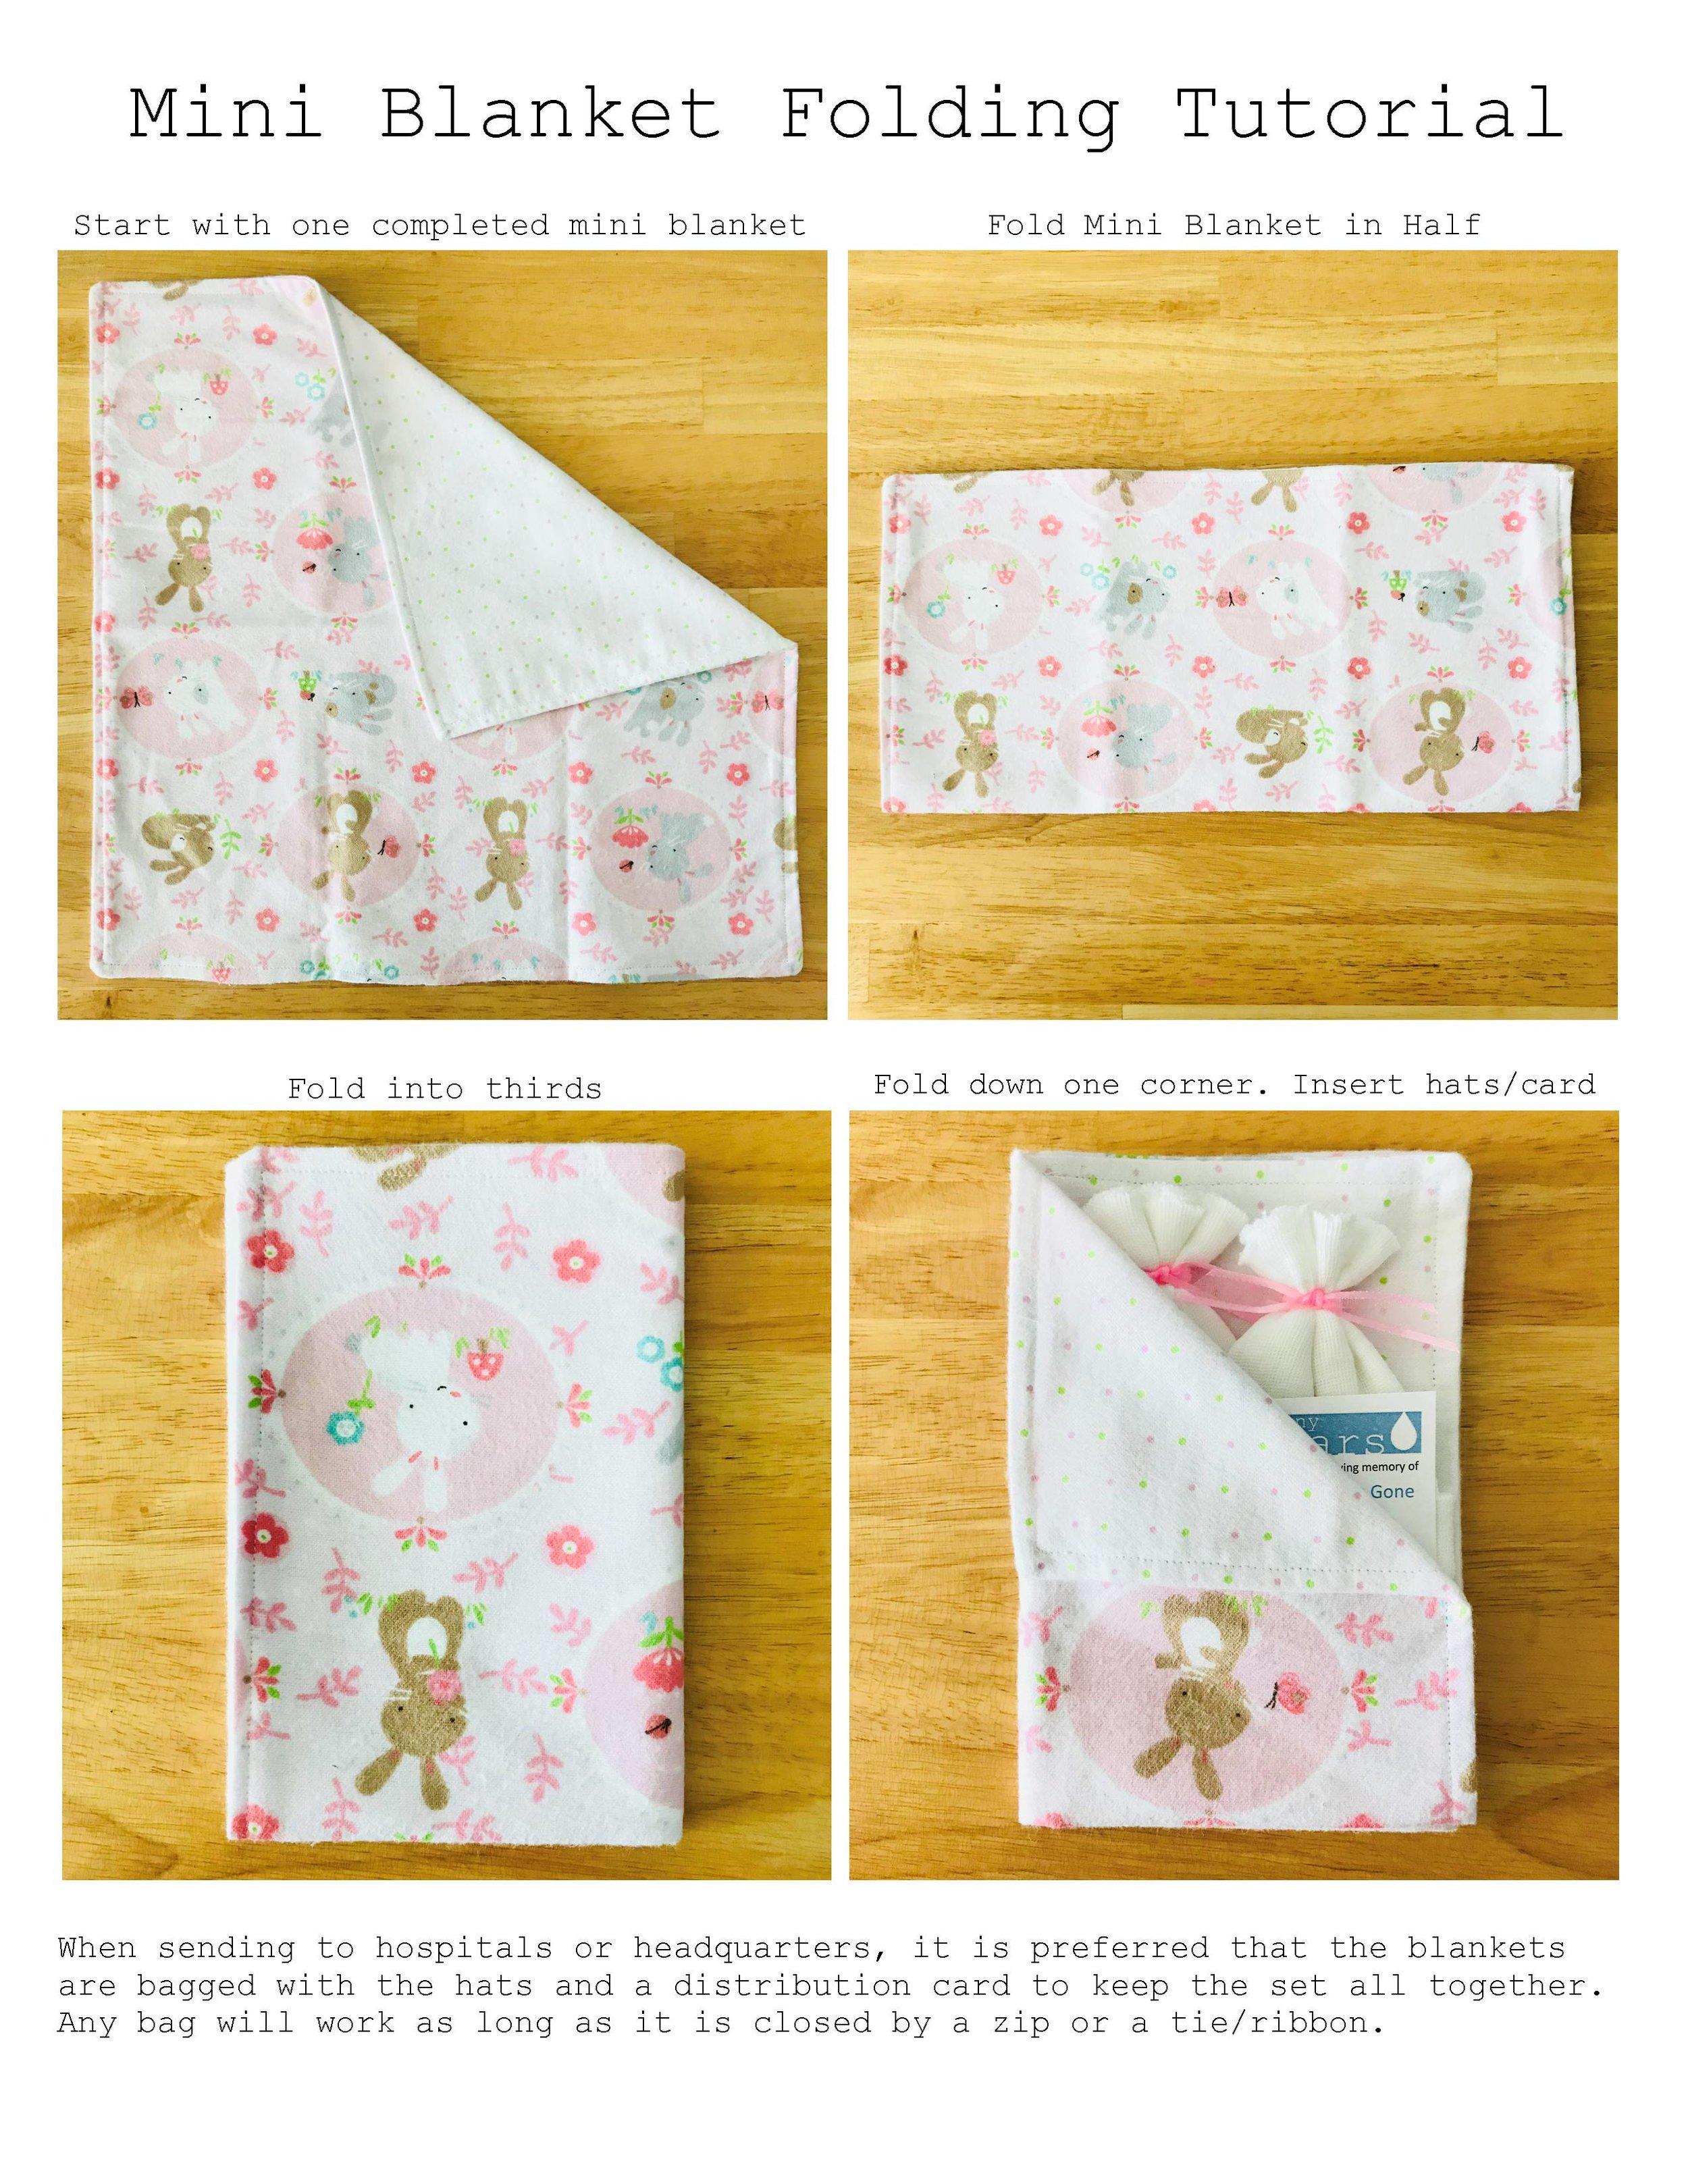 Mini Blanket Tutorial.jpg